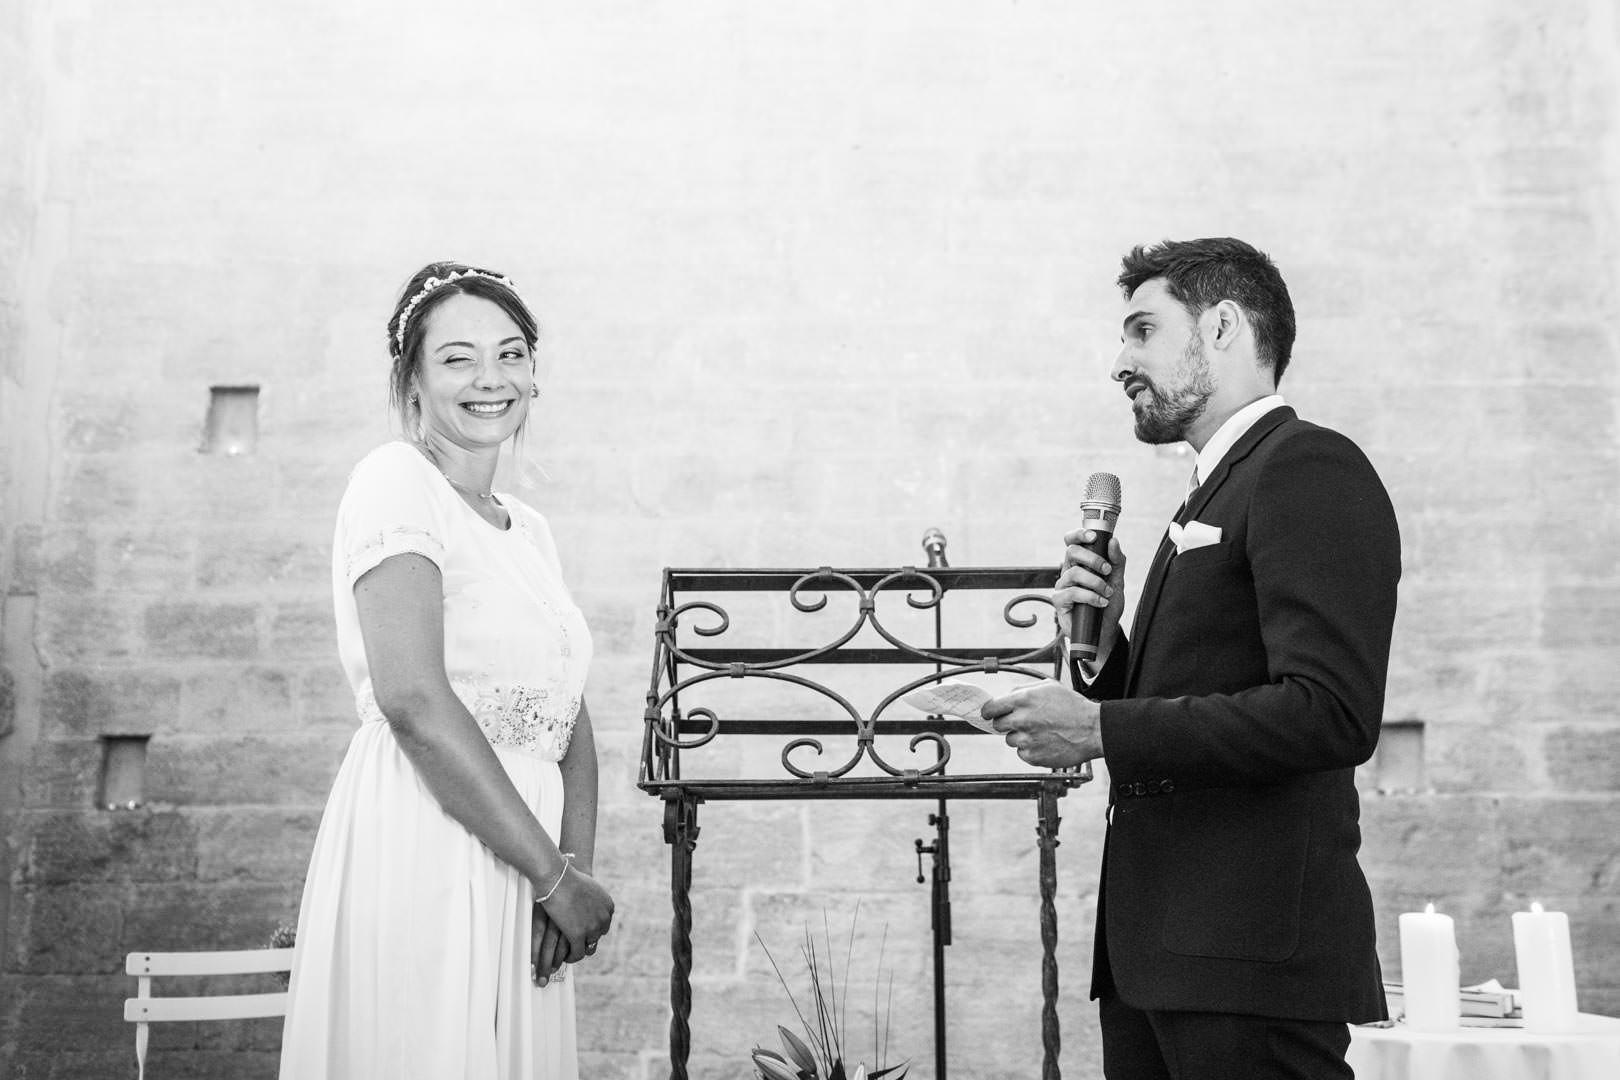 Clin d'oeil complice de la mariée, pendant le discours de son mari !